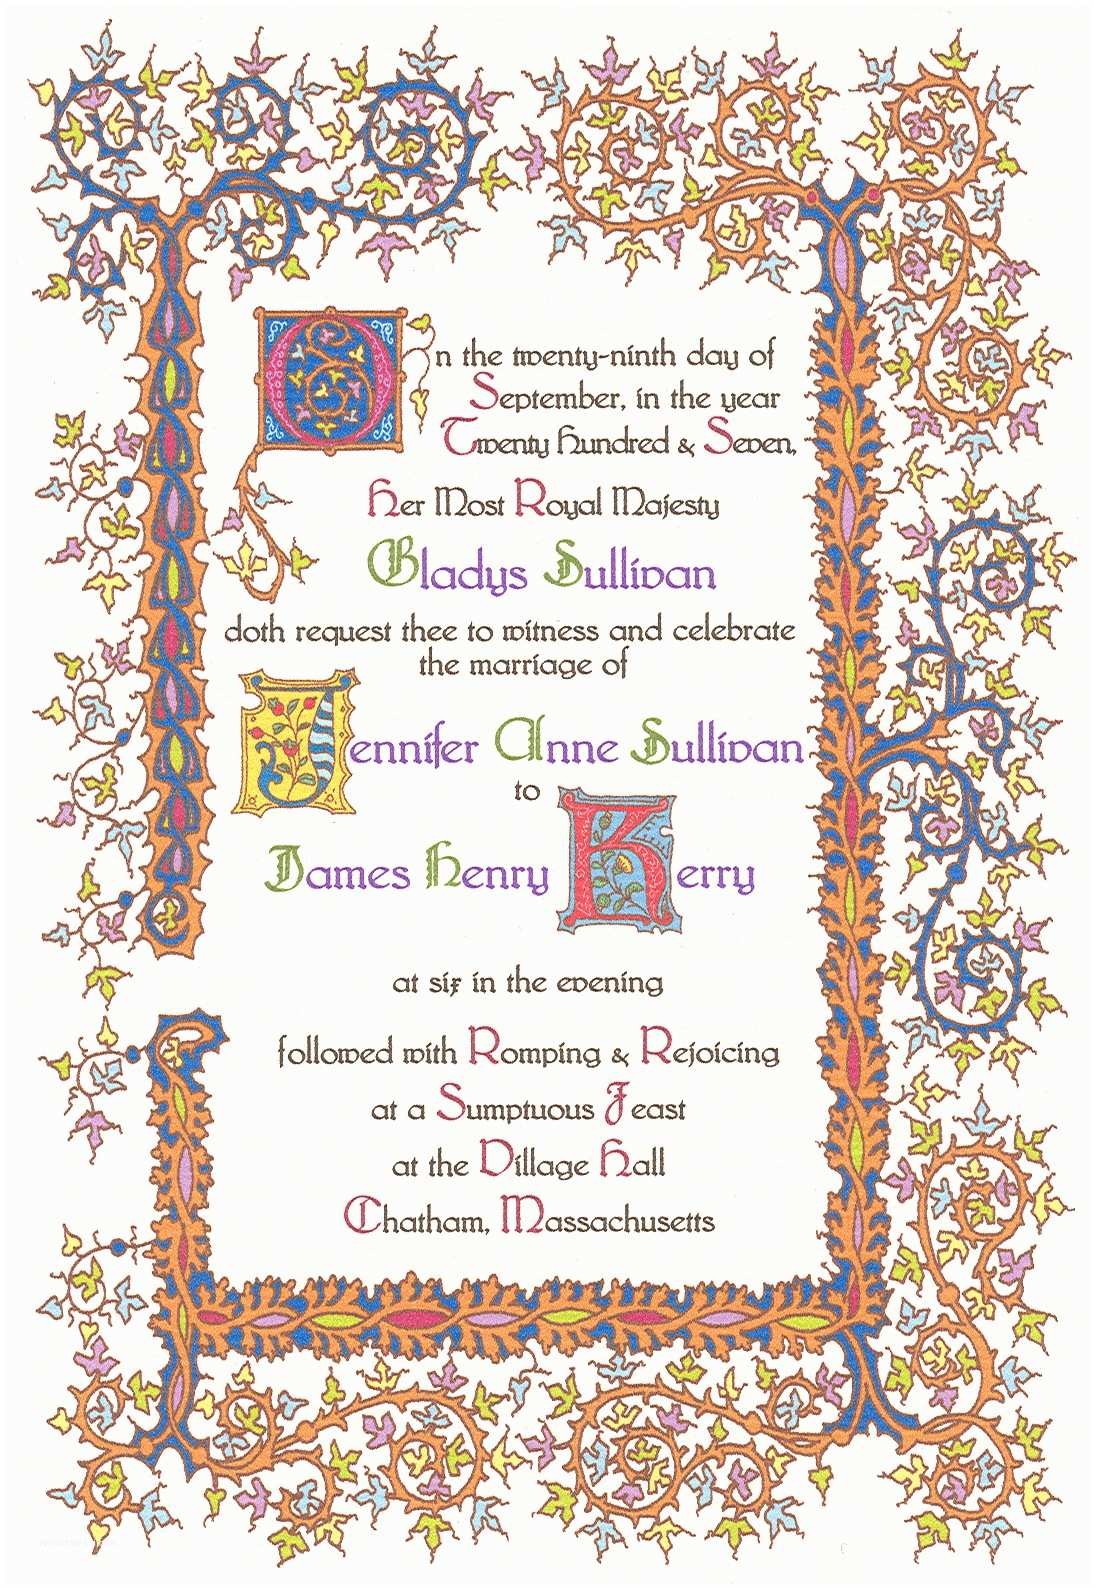 Medieval Wedding Invitations Wording 15th Century Renaissance Invitation